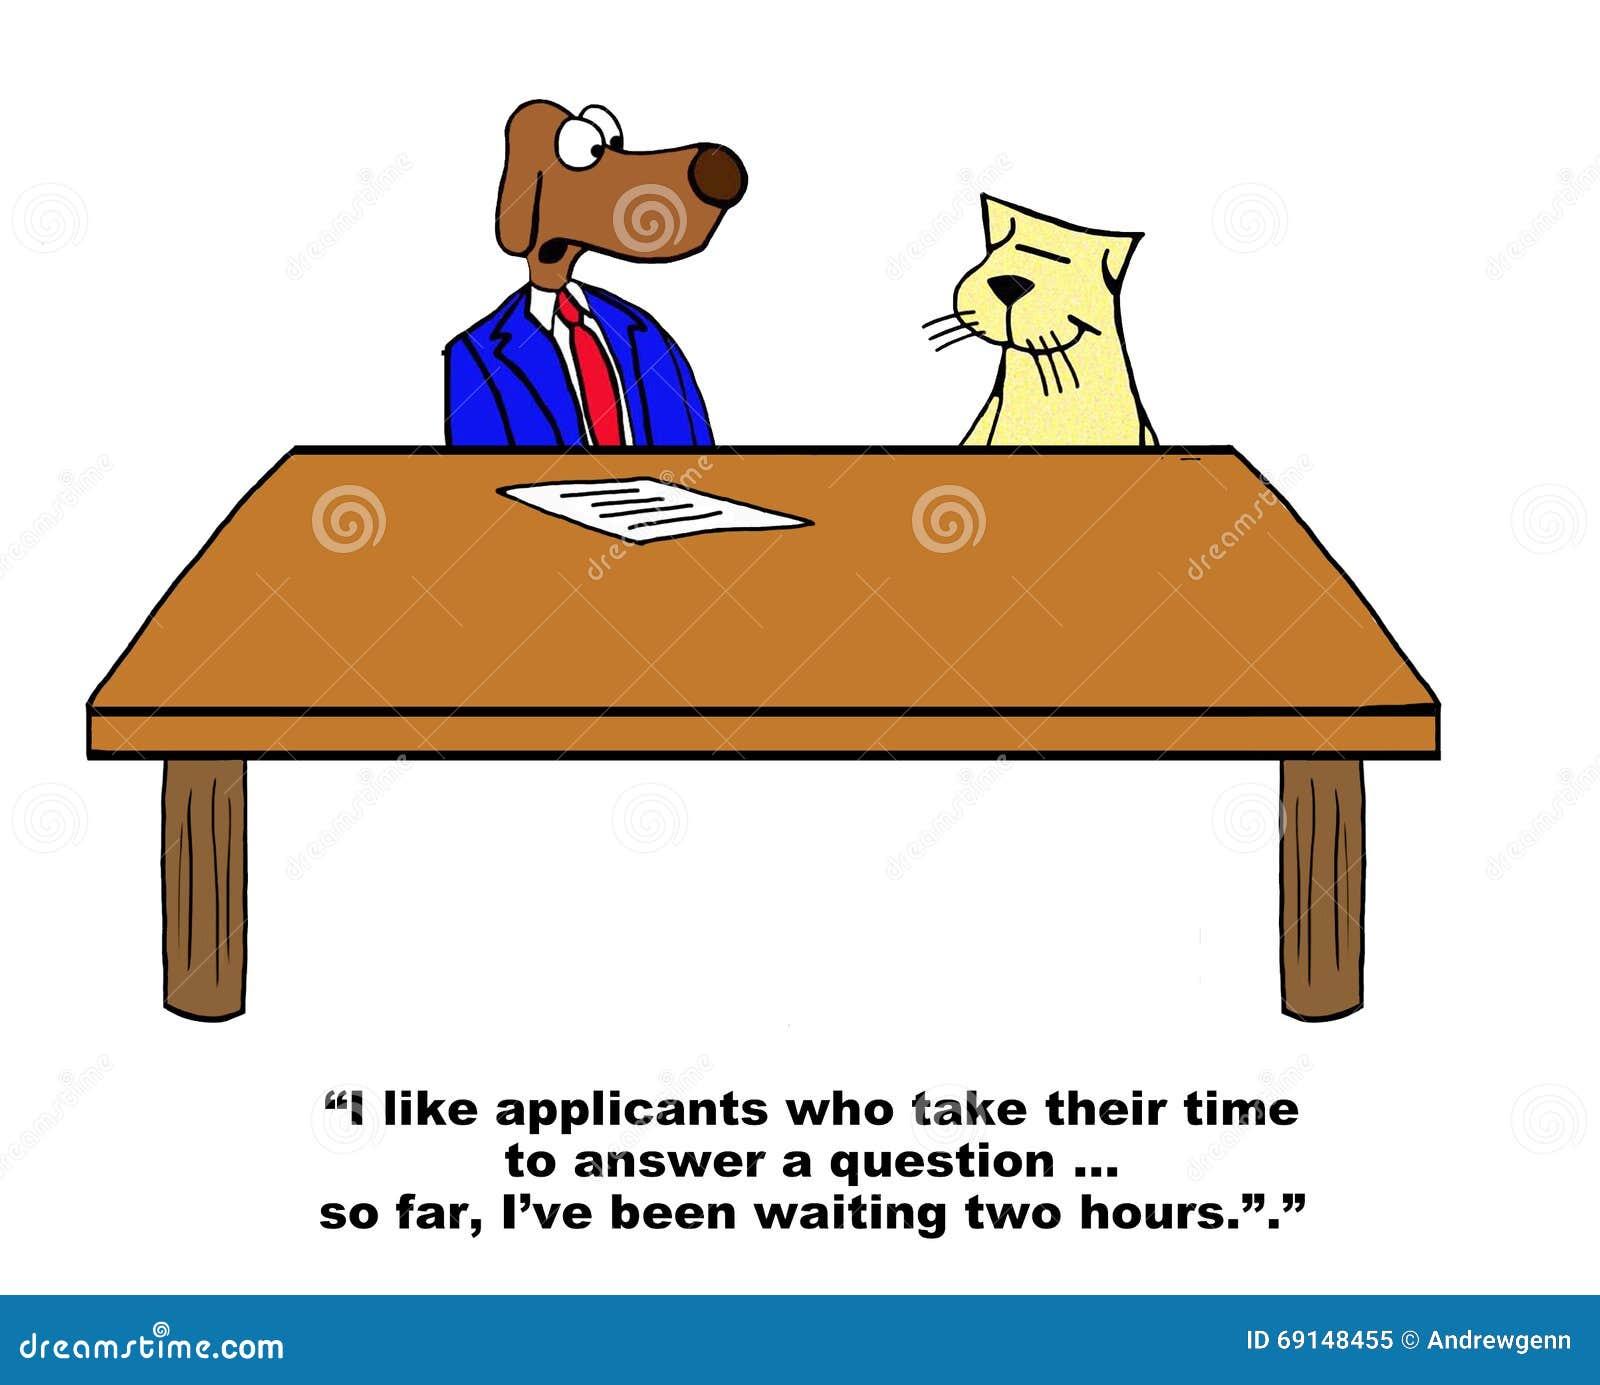 Job Interview Stock Illustration - Image: 69148455